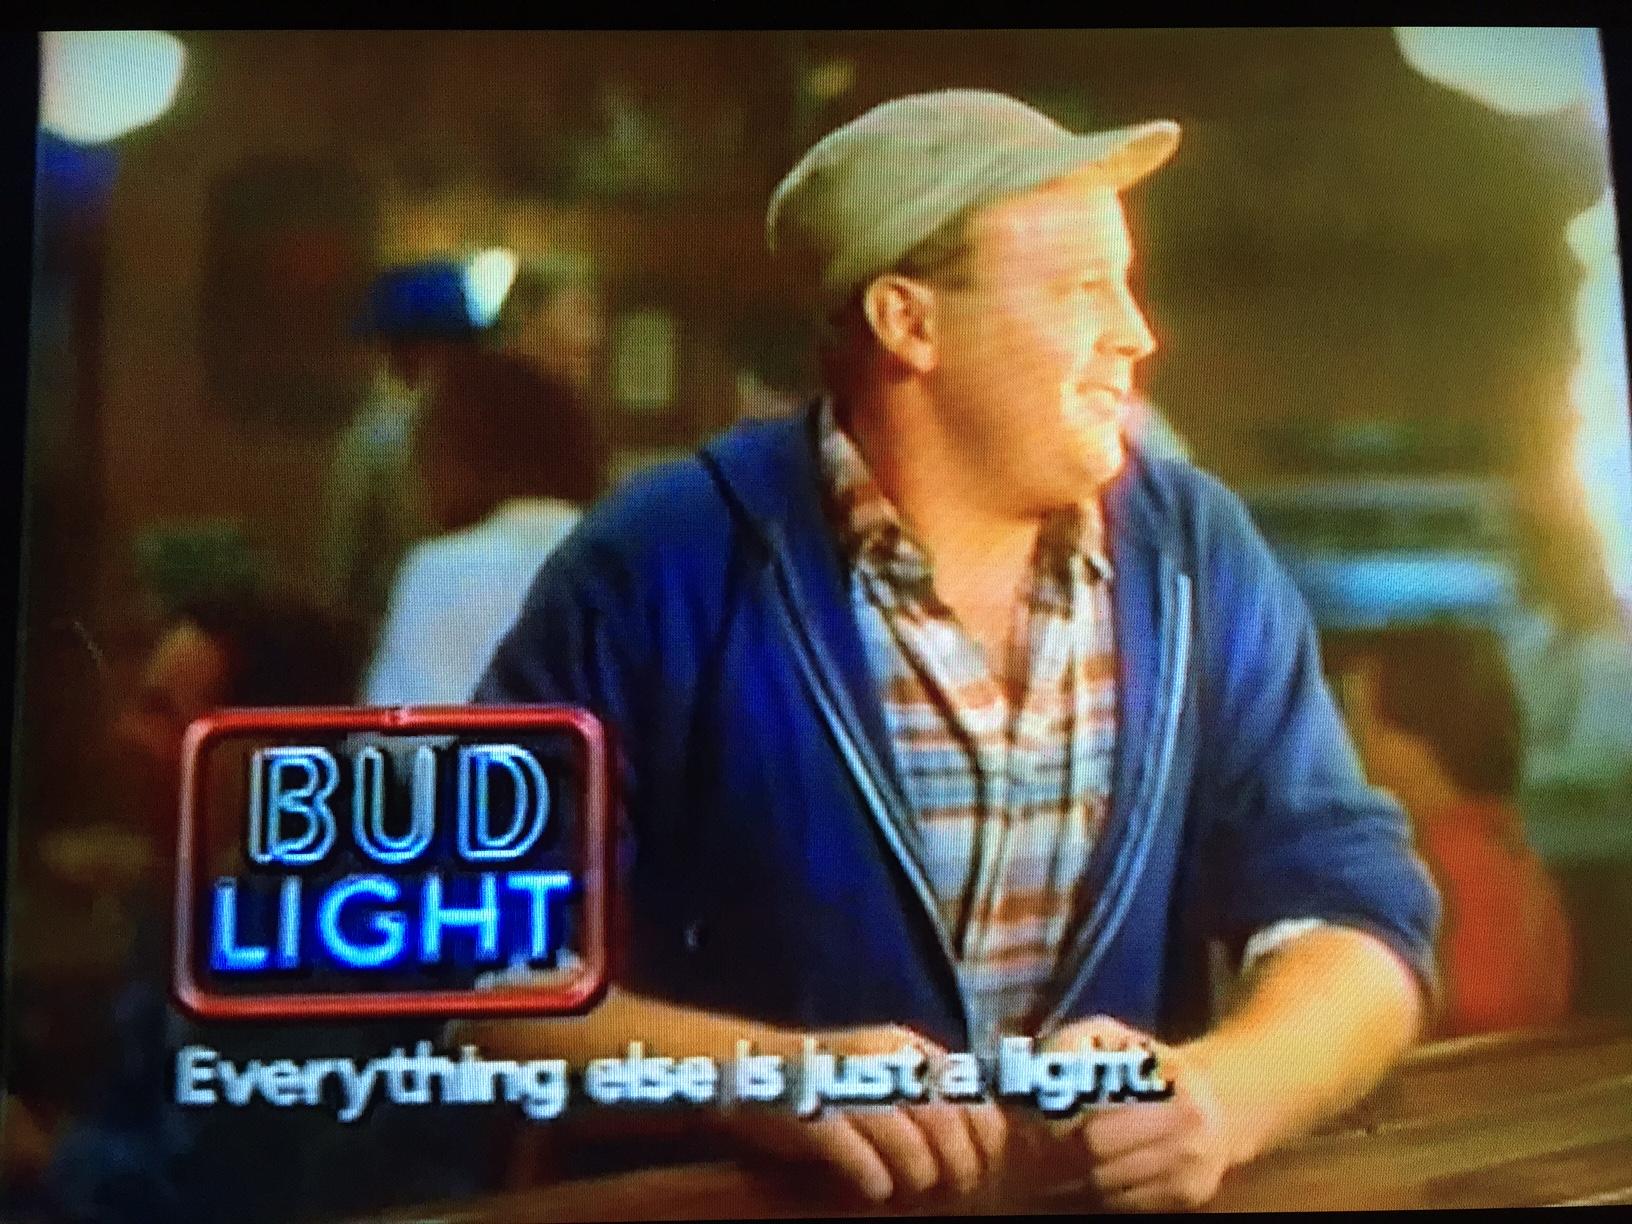 Bud Light Blind Date Commercial Bud Lightu0027s Super Bowl Ad Sends One Average  Guy On The